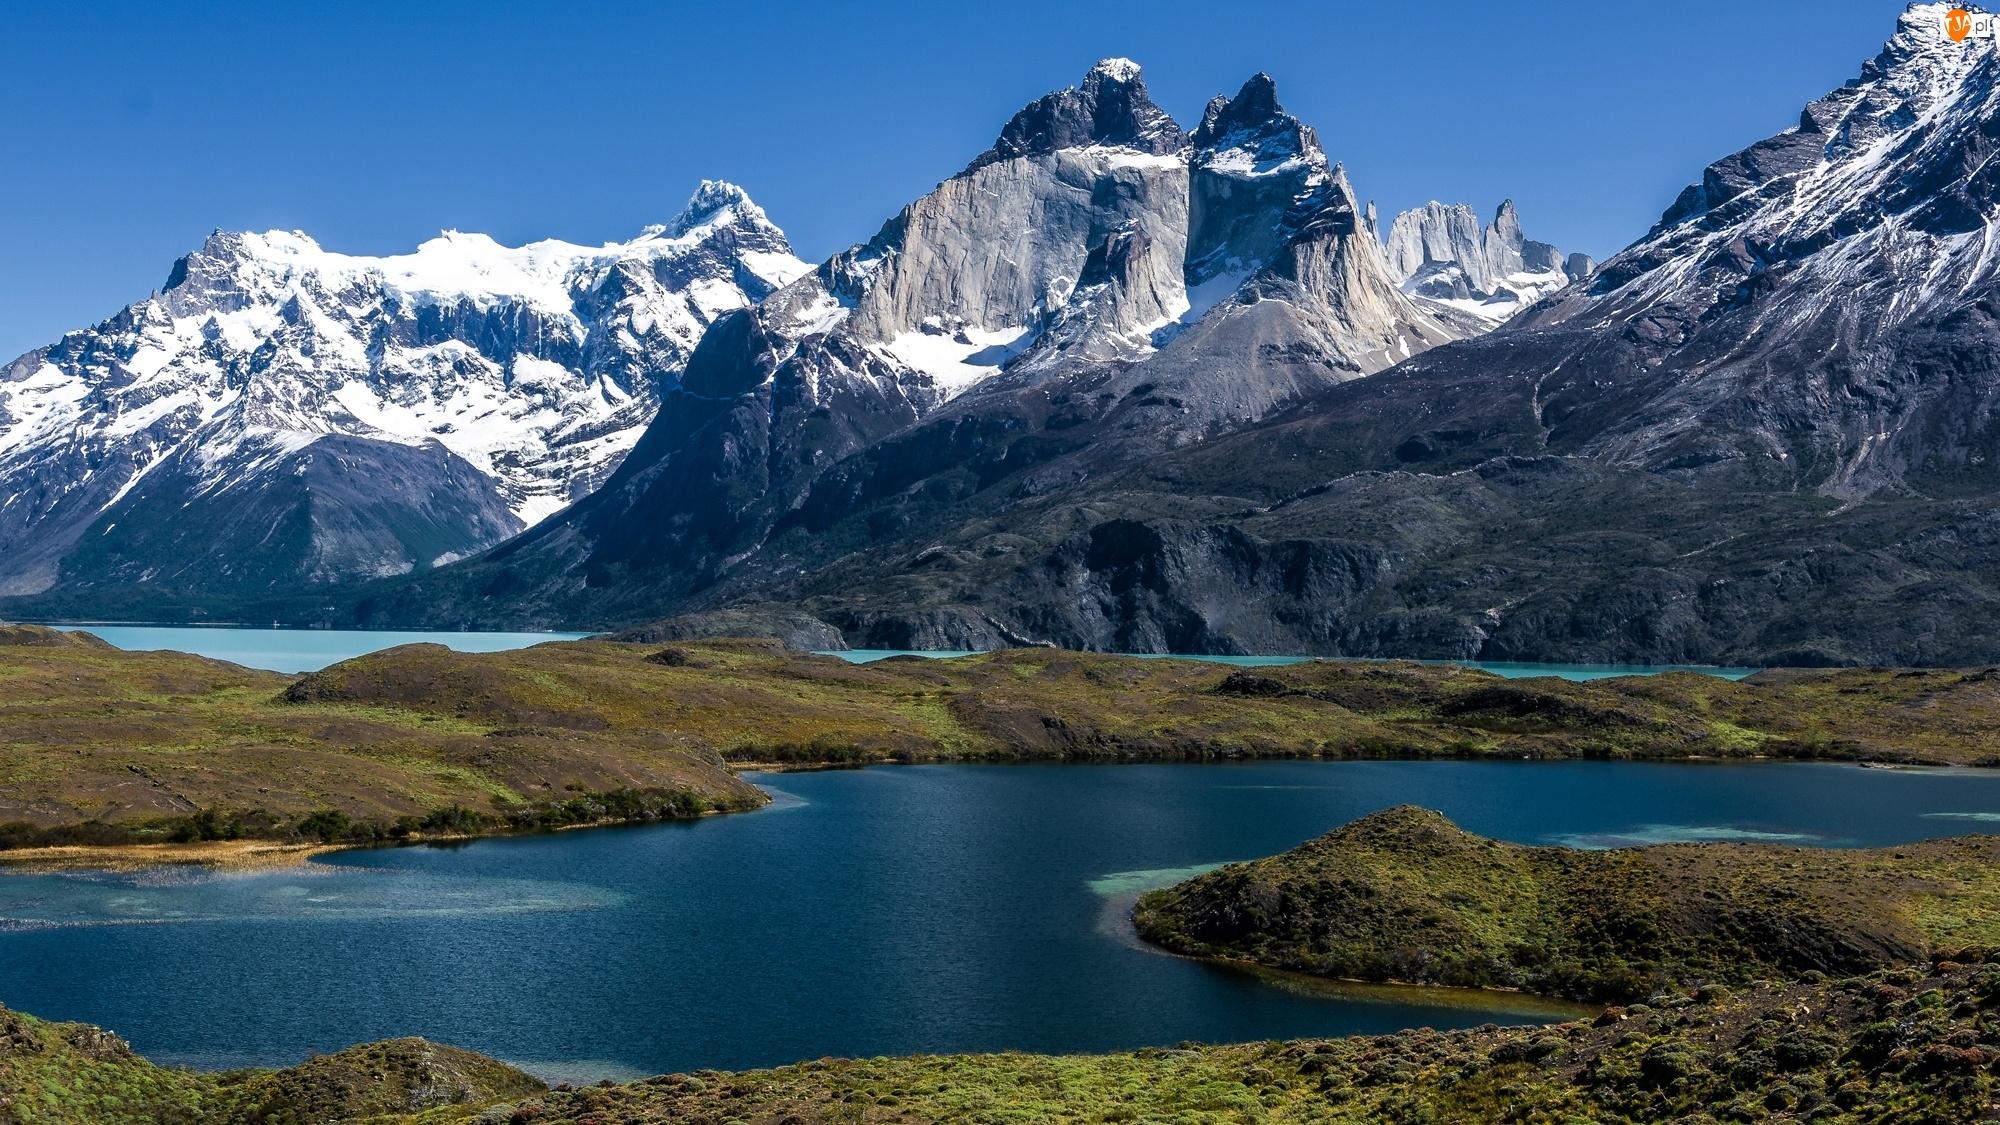 Chile, Śnieg, Góry, Jeziora